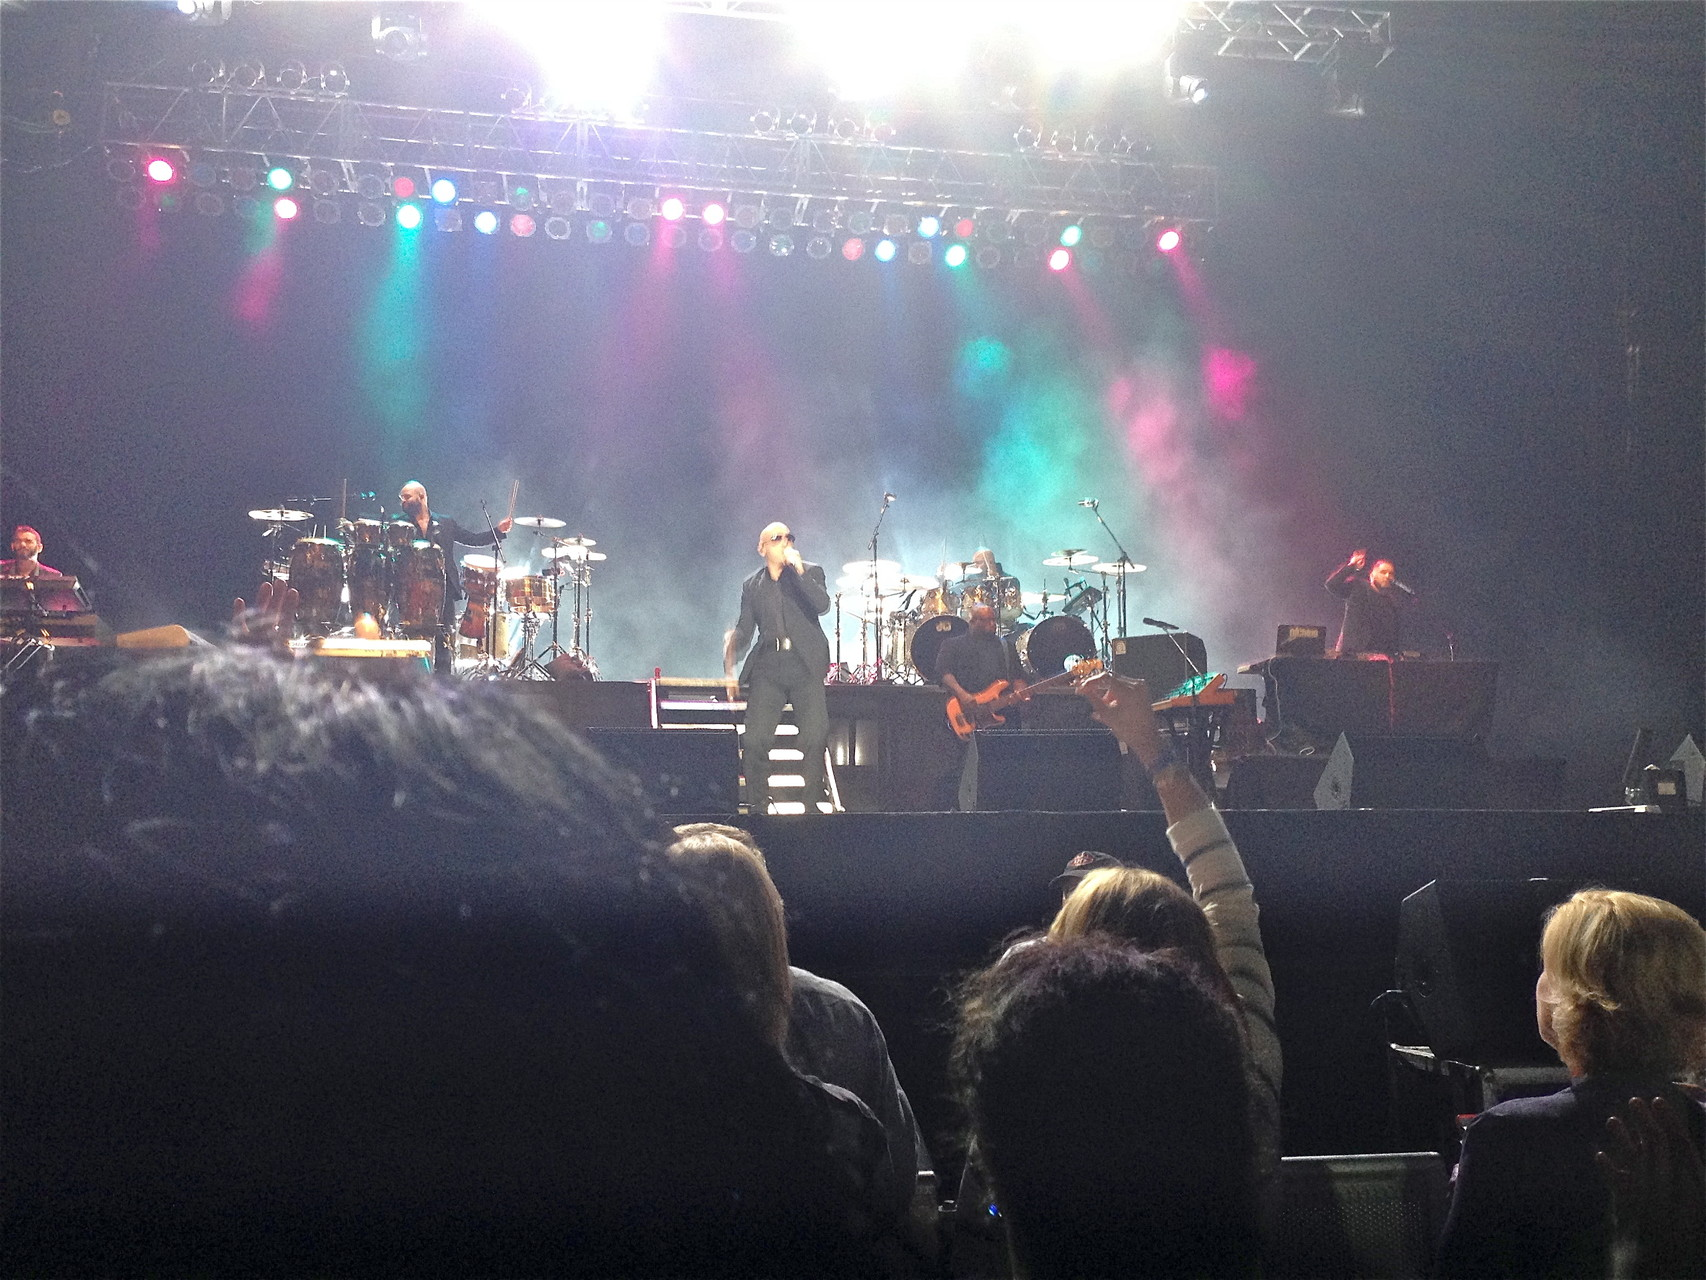 Pitbull Concert, NY State Fair, 2014